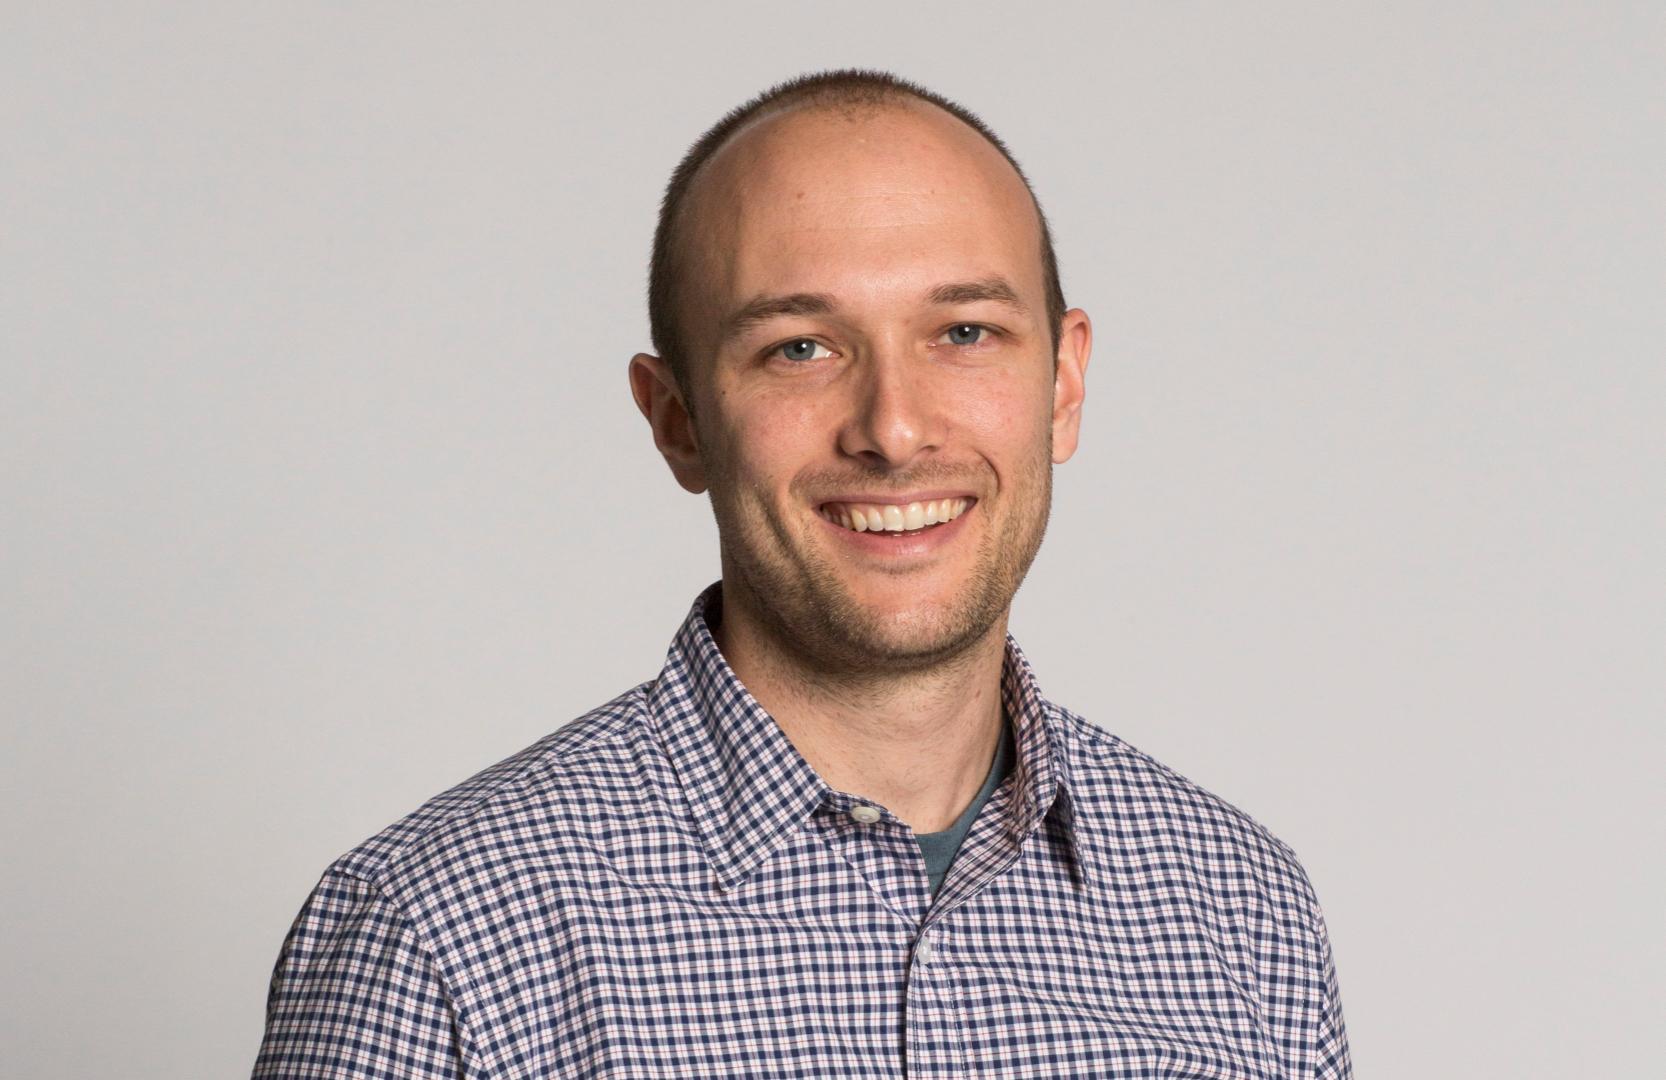 Logan Green Lyft CEO headshot wide